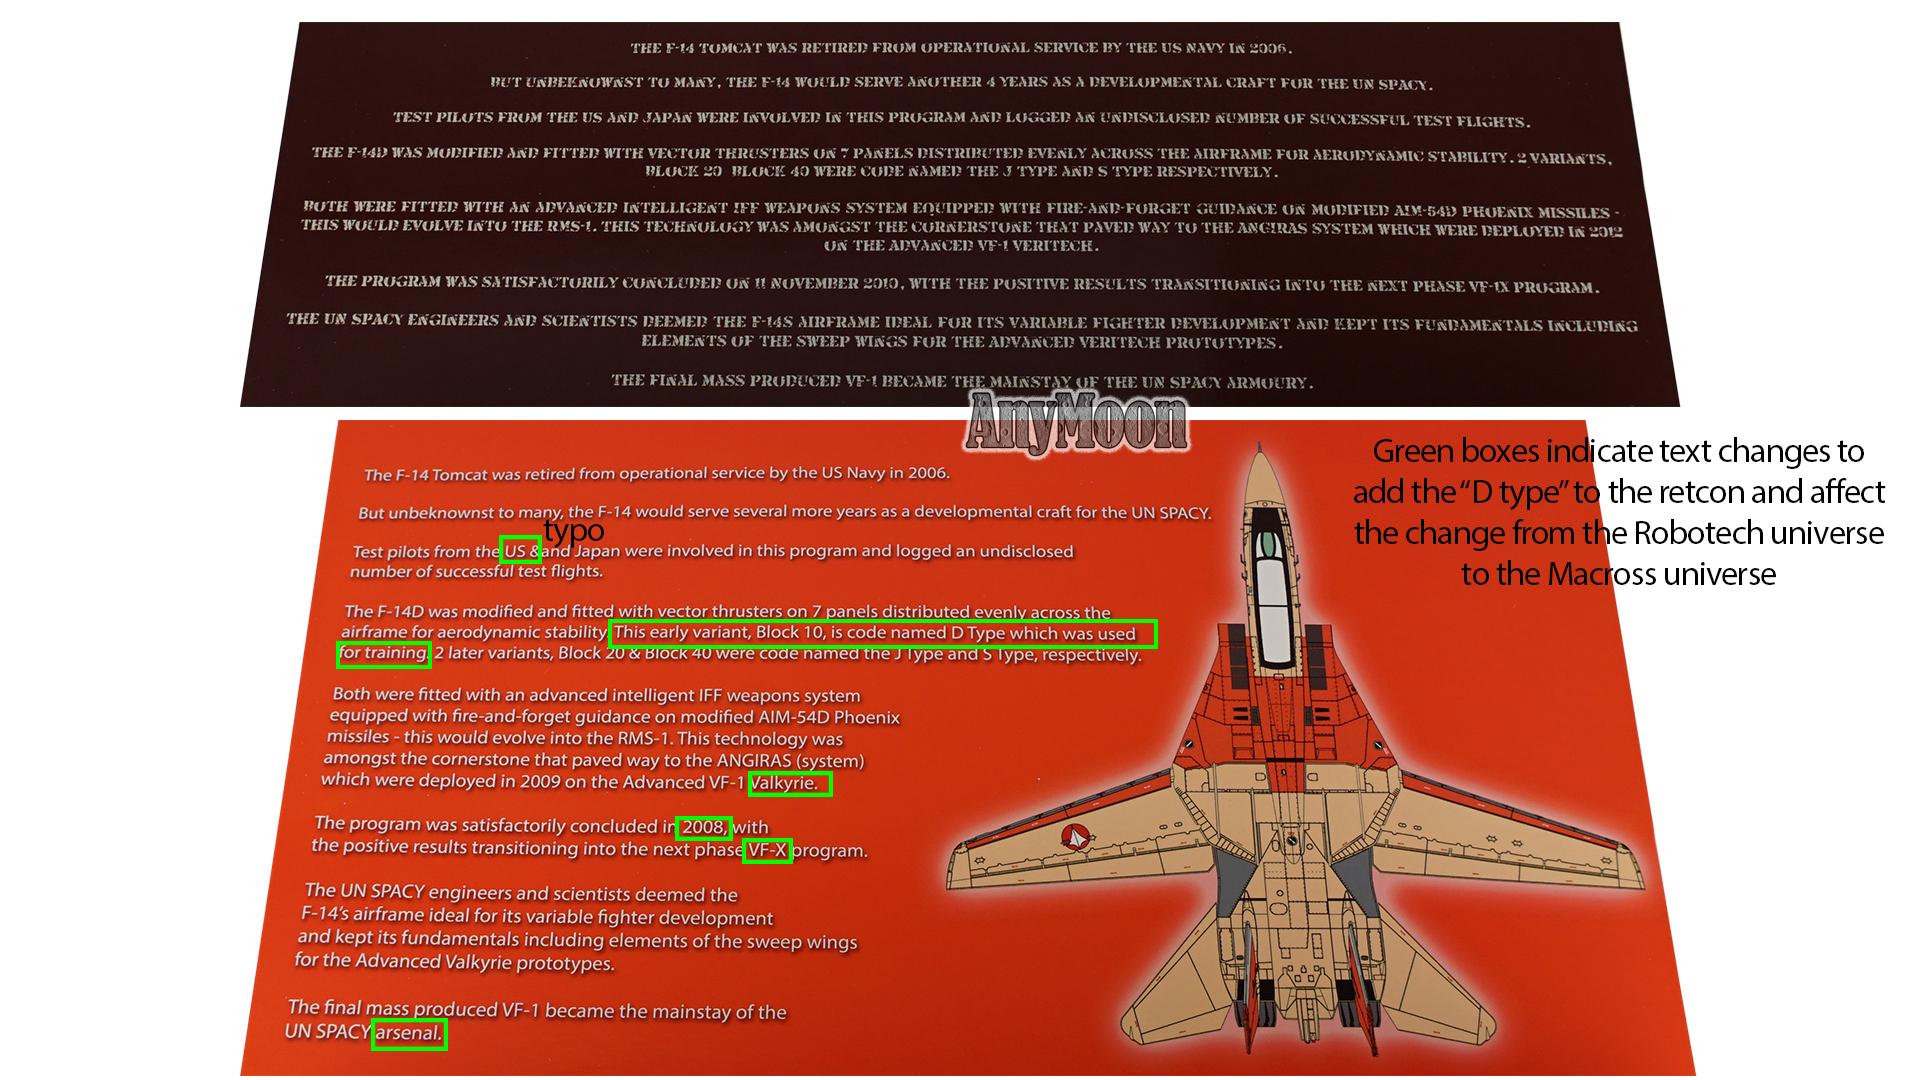 Calibre Wings 1/72 F-14 Tomcat Die-cast Metal Models – Scorched